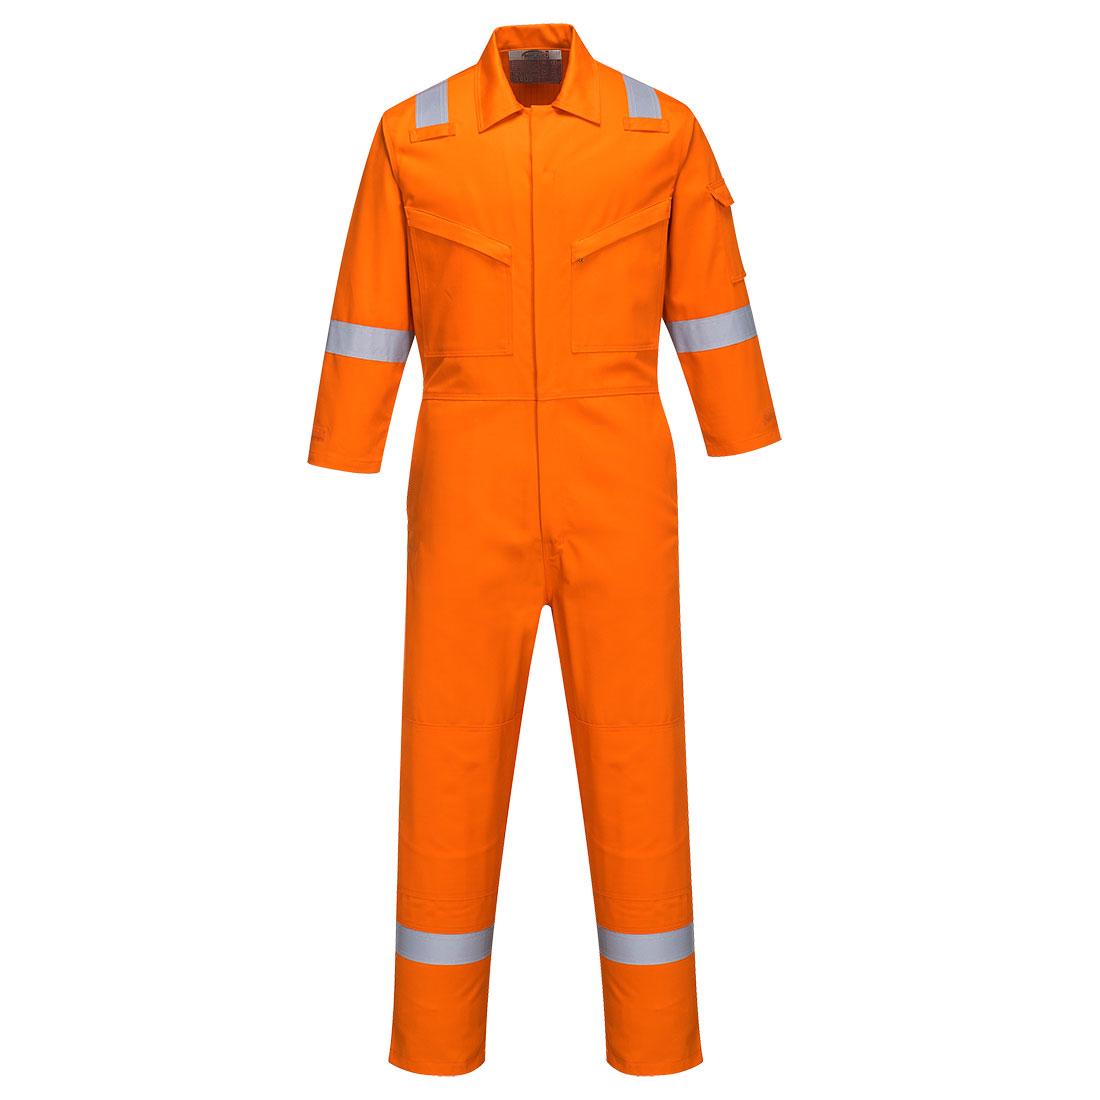 Bizflame Plus Ladies Coverall 350g Orange XXL